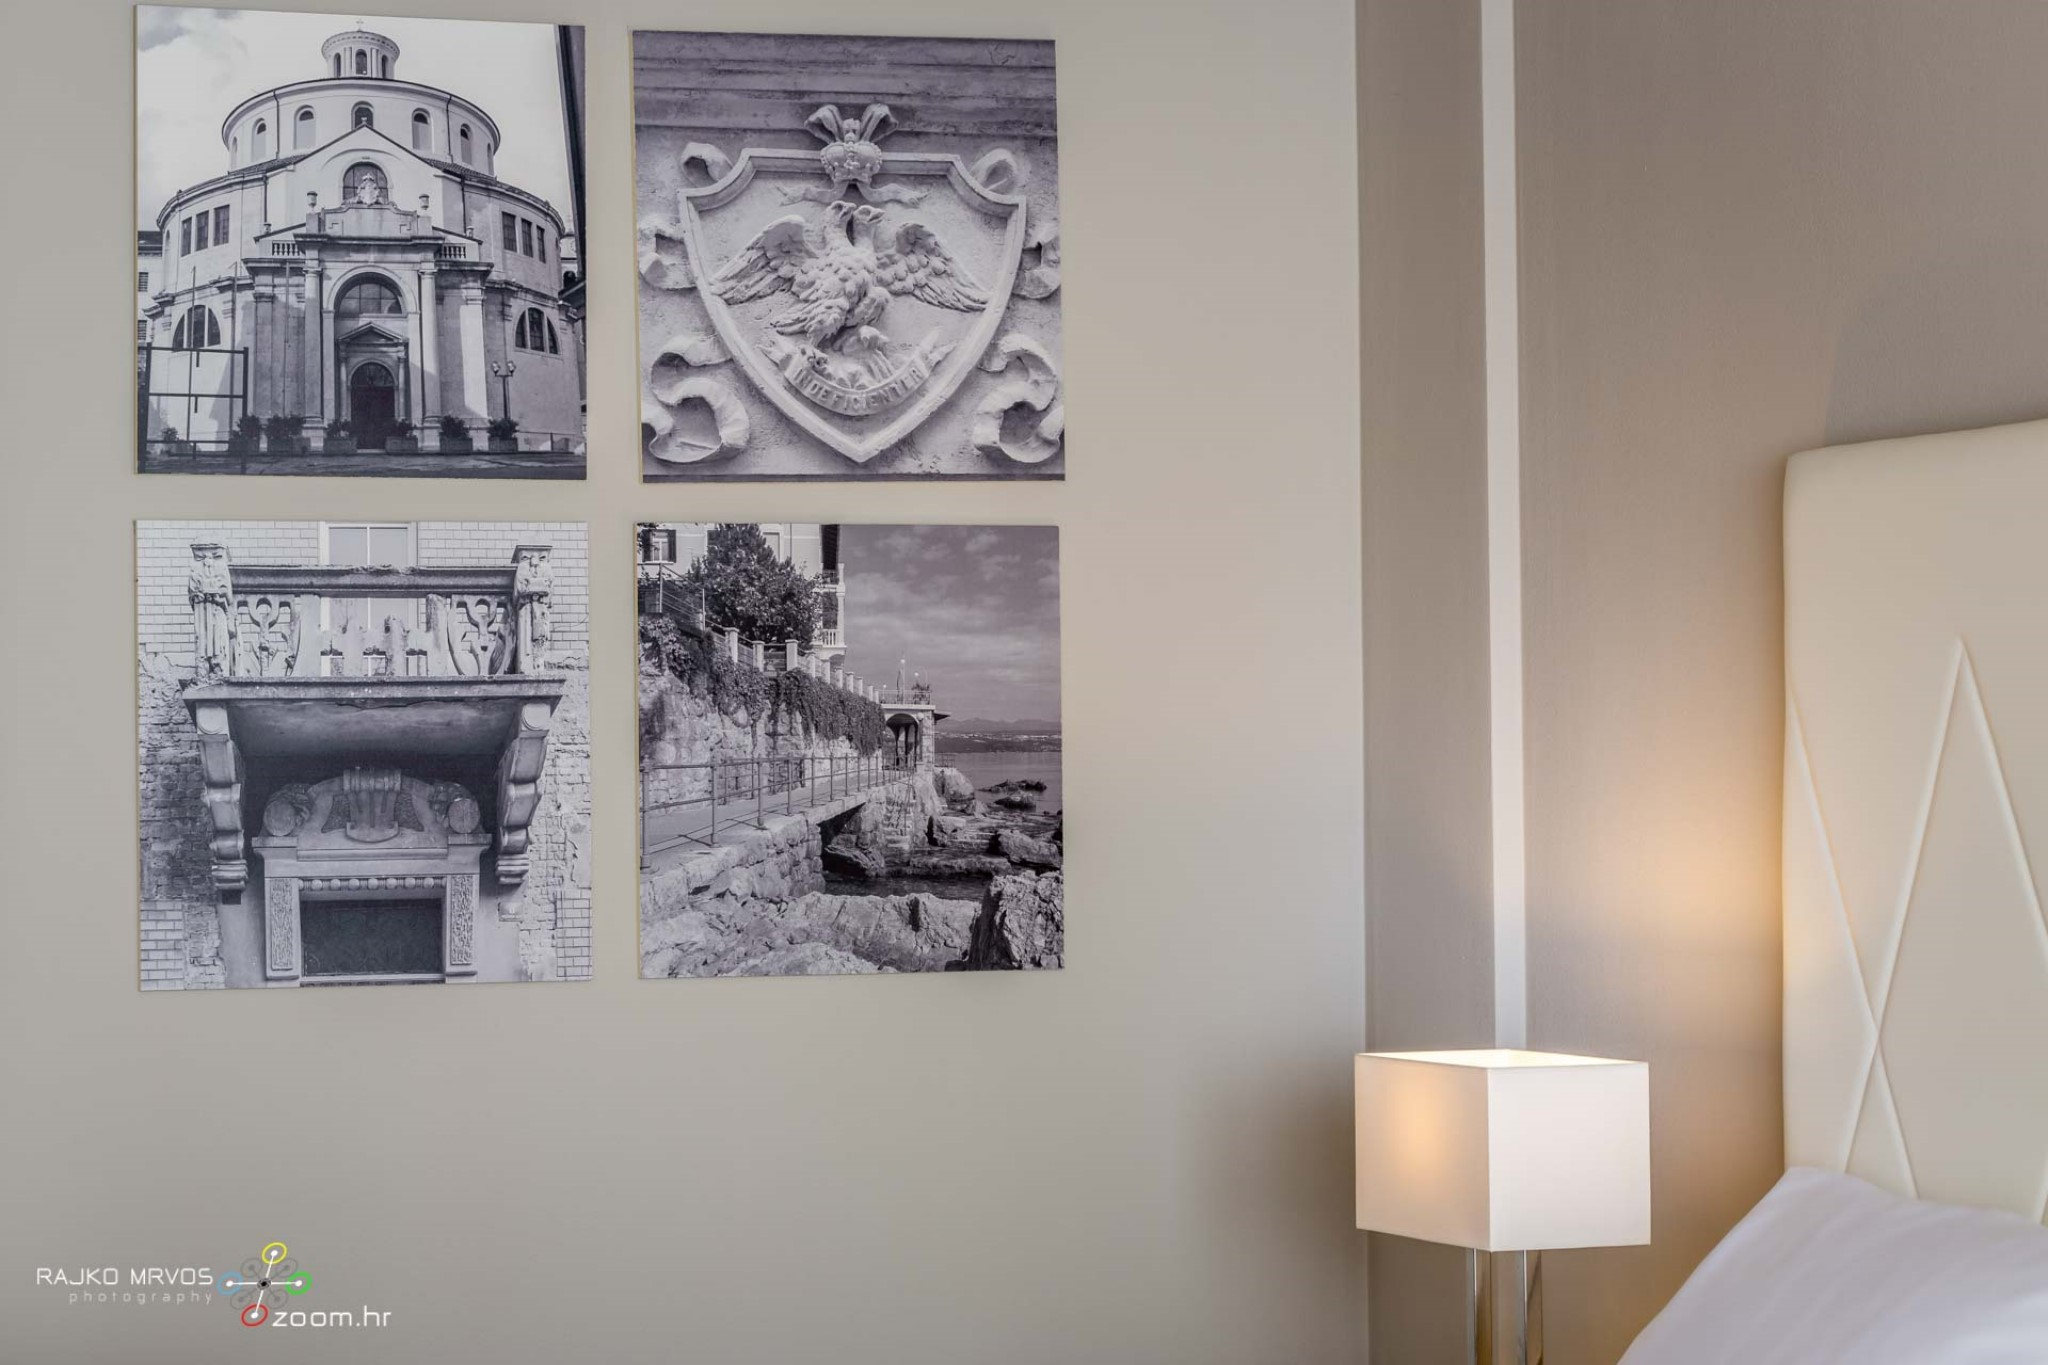 fotografiranje-interijera-fotograf-eksterijera-apartmana-vila-kuca-apartman-Preelook-17